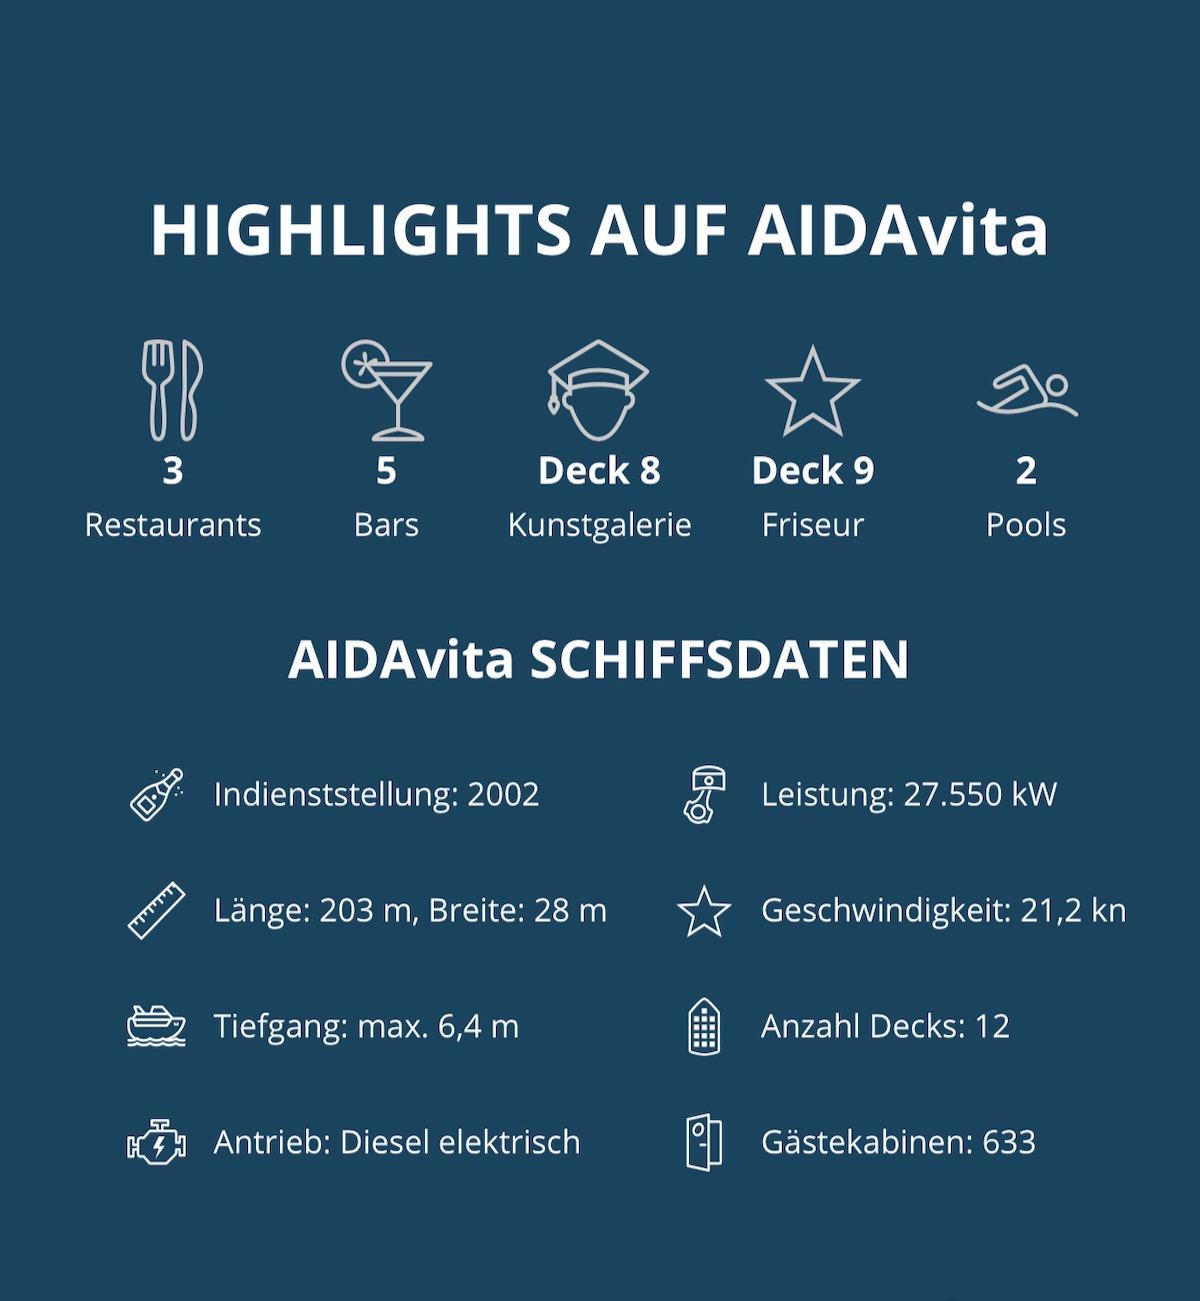 aida-cruises-ships-aidavita-daten-mobil